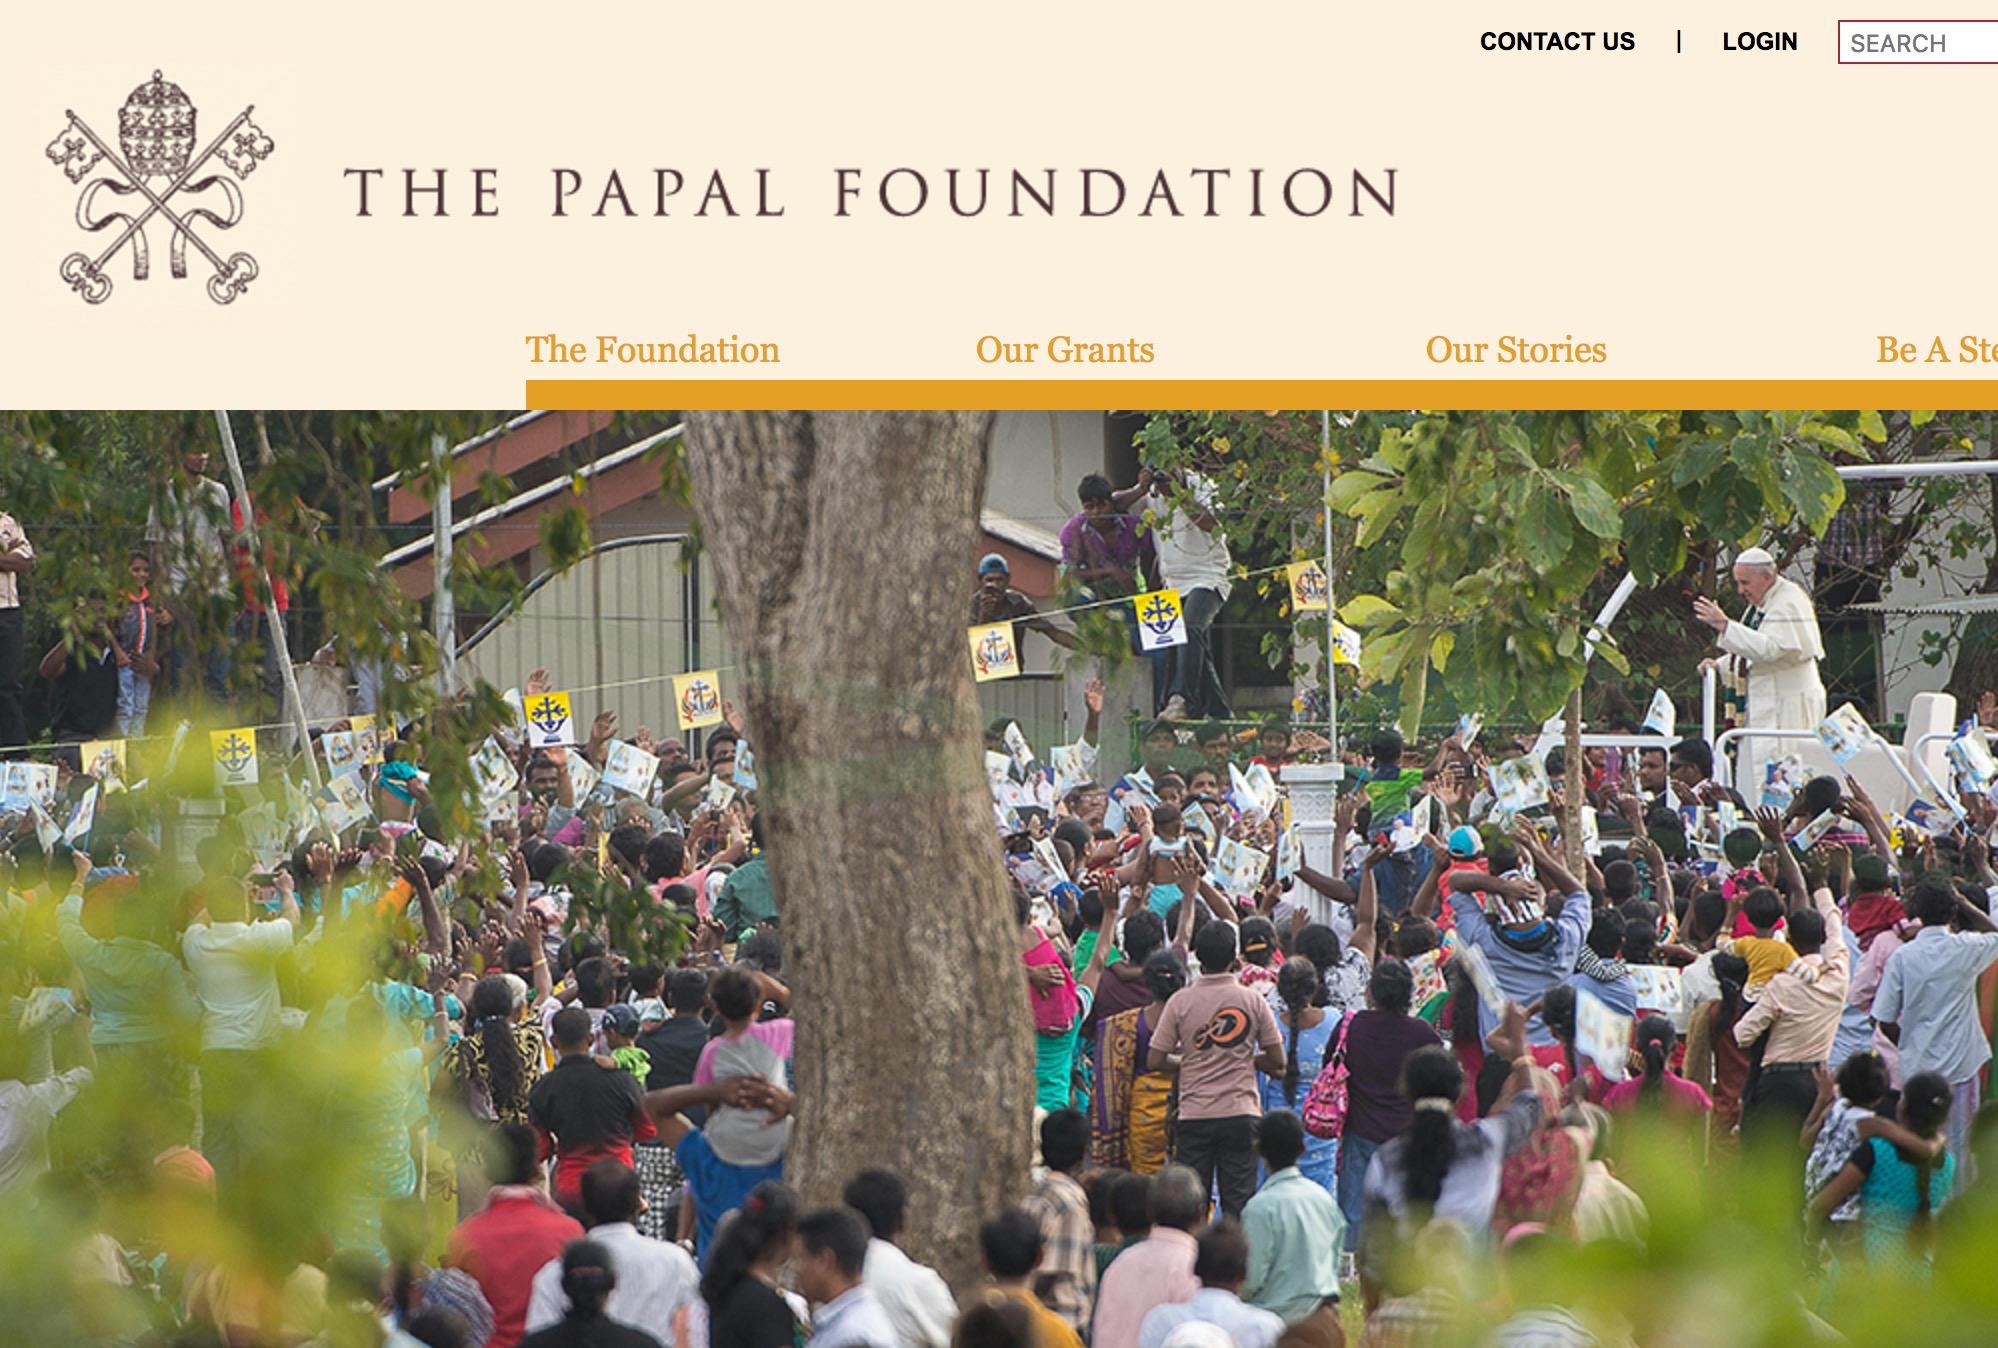 La web de la Papal Foundation